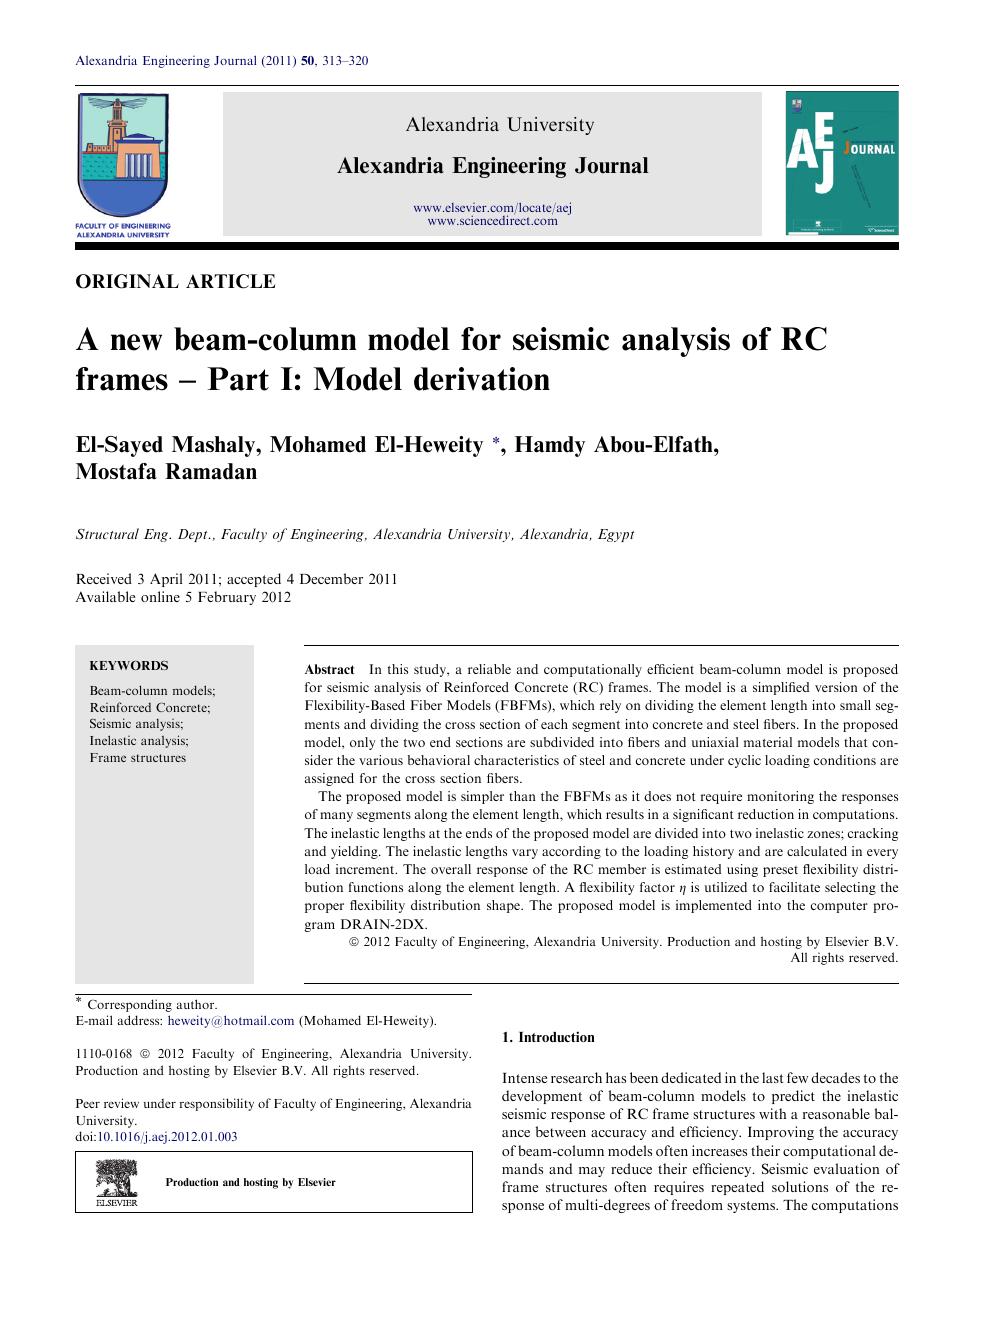 A new beam-column model for seismic analysis of RC frames